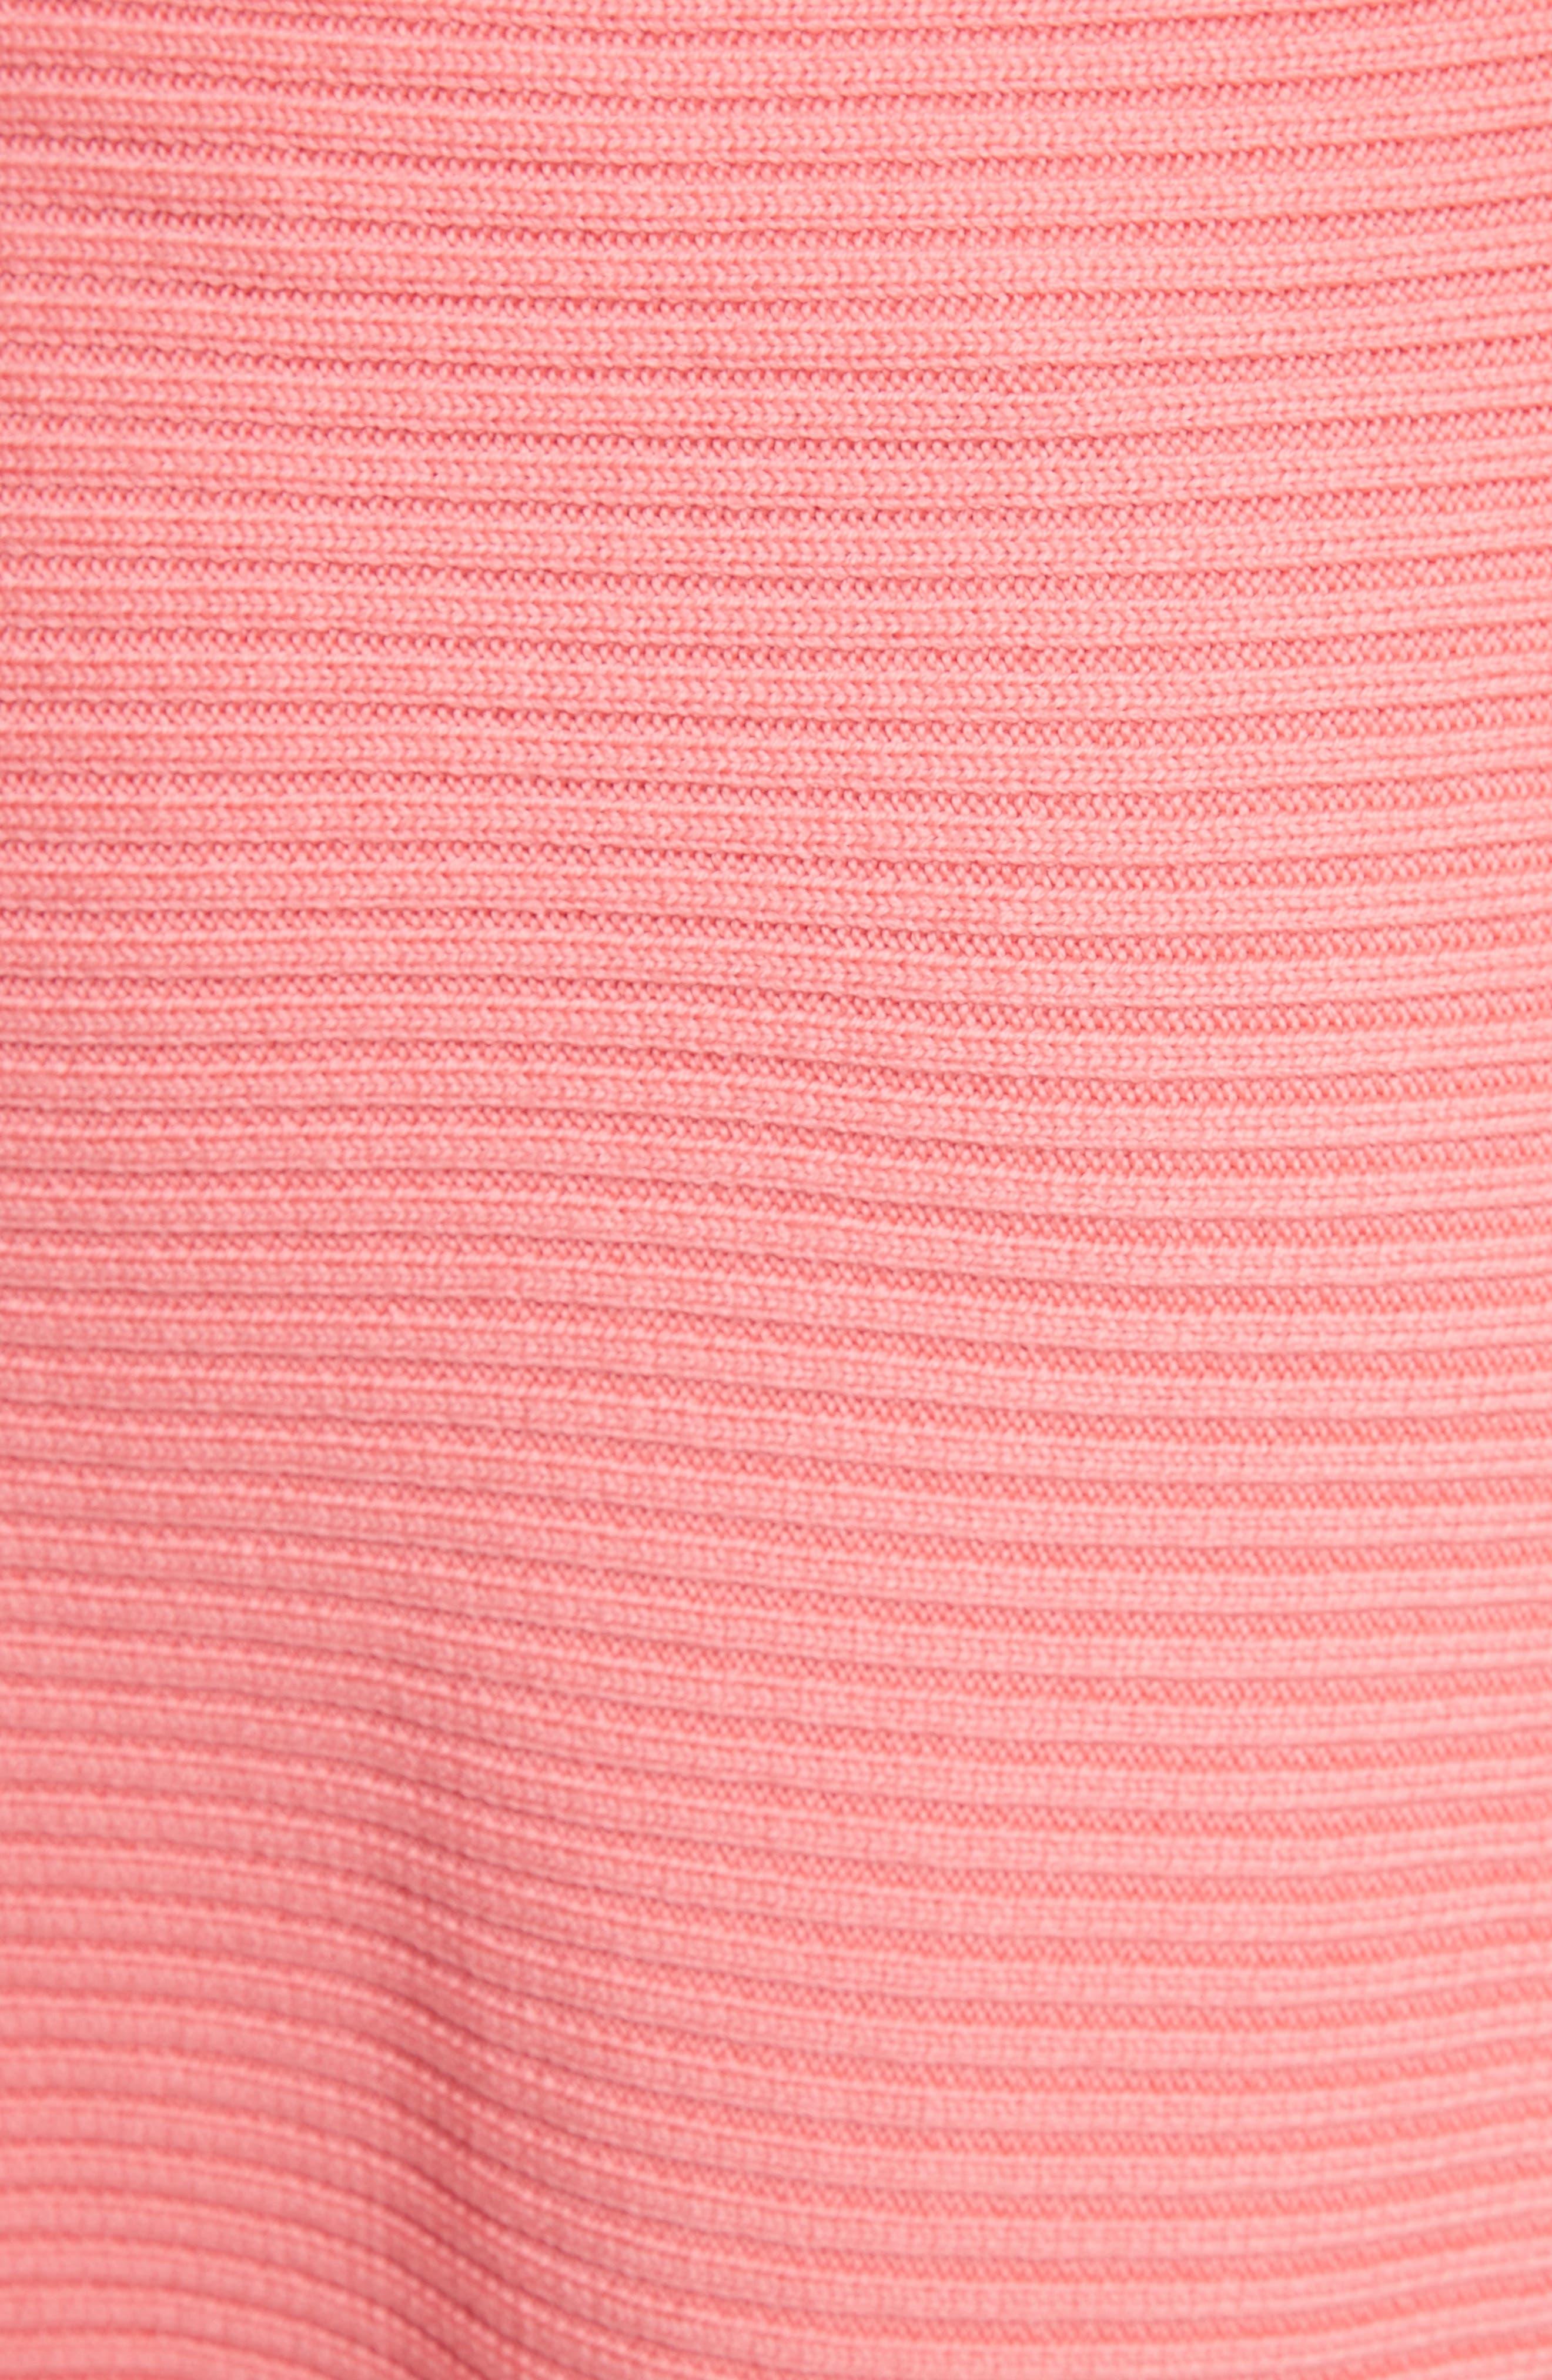 Asymmetrical Rib Merino Wool Skirt,                             Alternate thumbnail 5, color,                             650